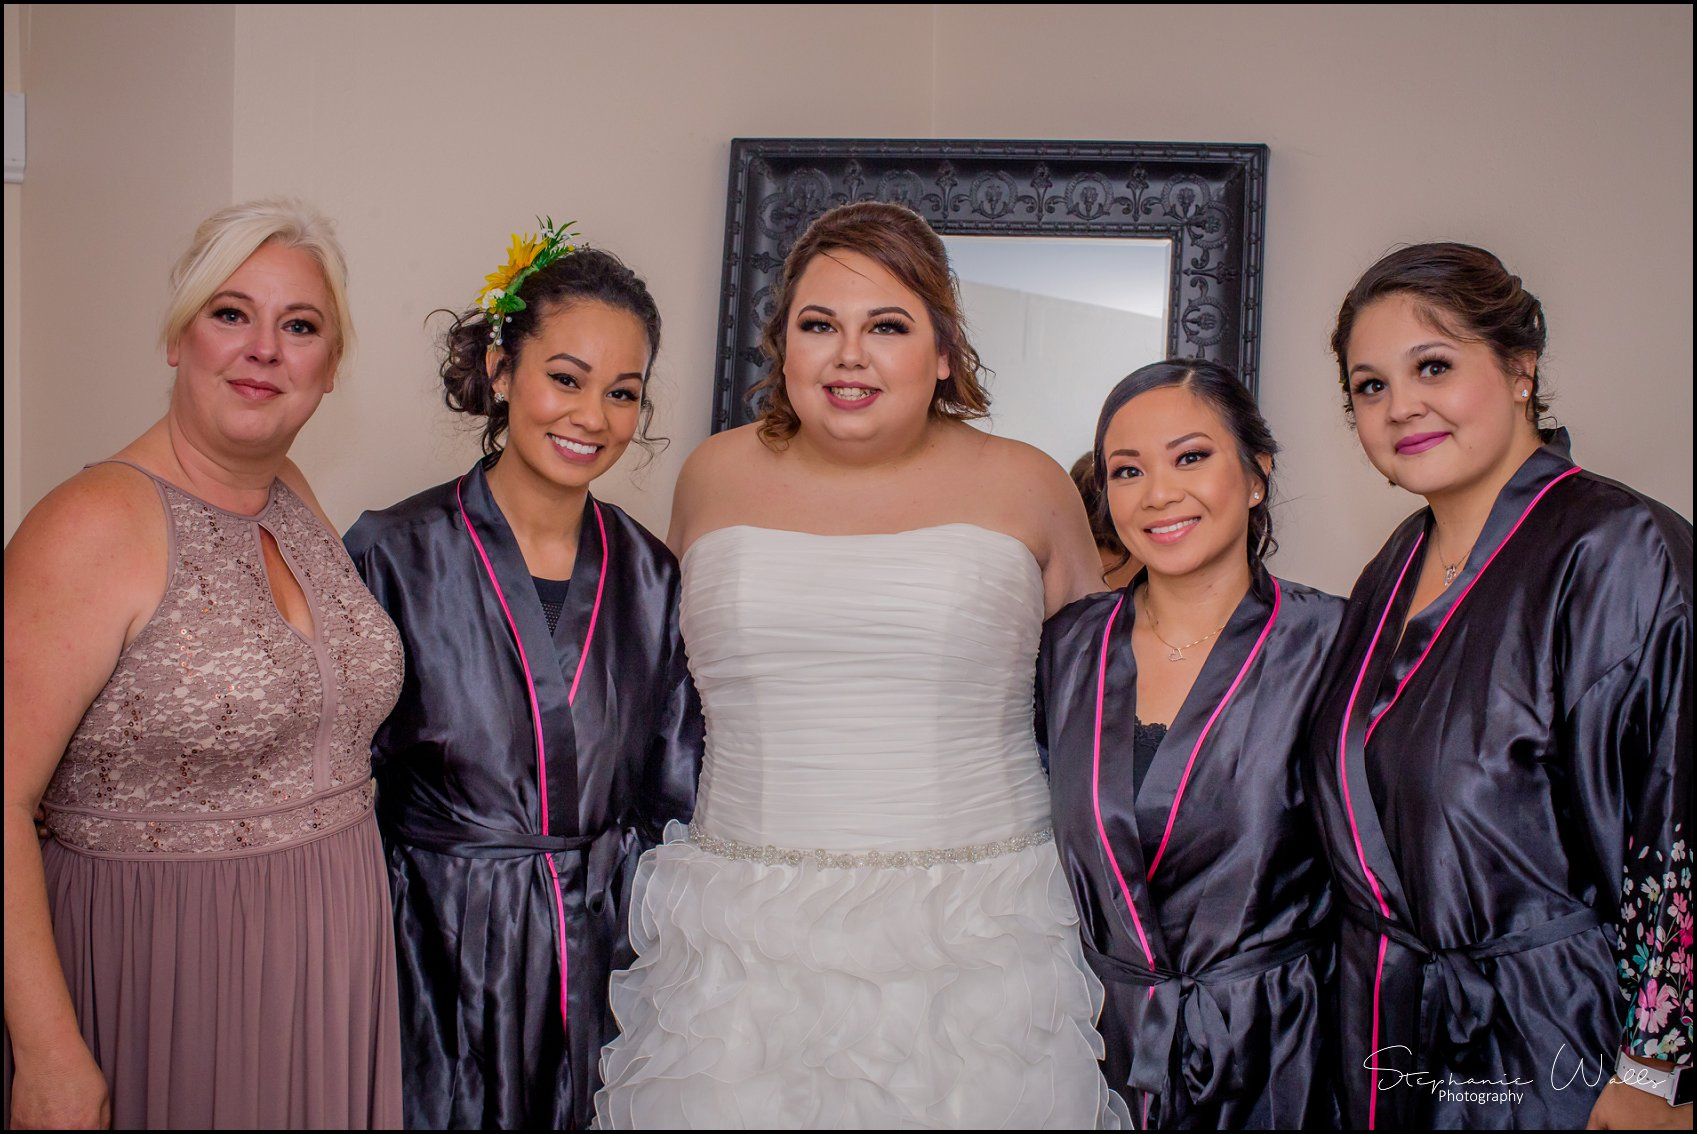 Kimble Wedding 017 Marlena & Allans | Snohomish Red Barn Events (Stocker Farms) | Snohomish, Wa Wedding Photographer